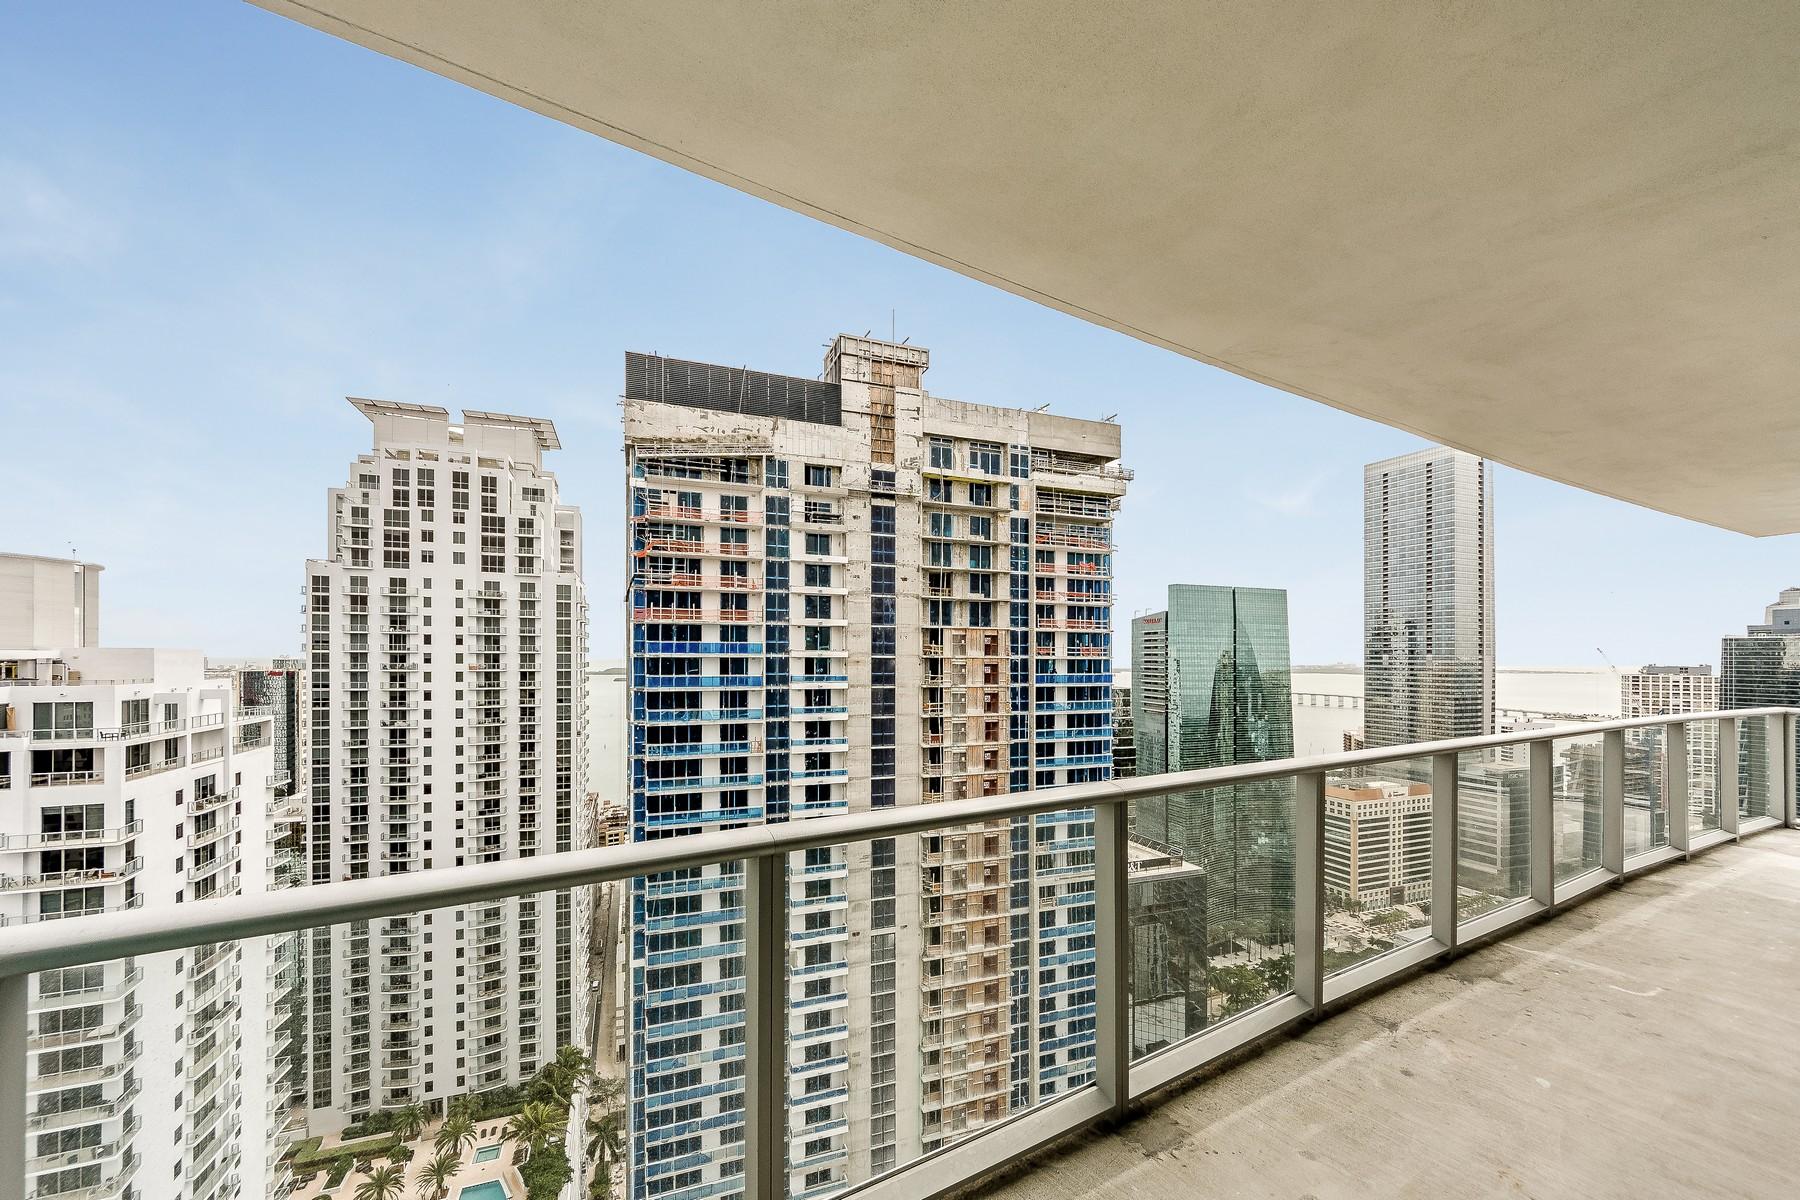 Condominium for Sale at 1100 S Miami Ave #3801 1100 S Miami Ave 3801 Miami, Florida, 33130 United States